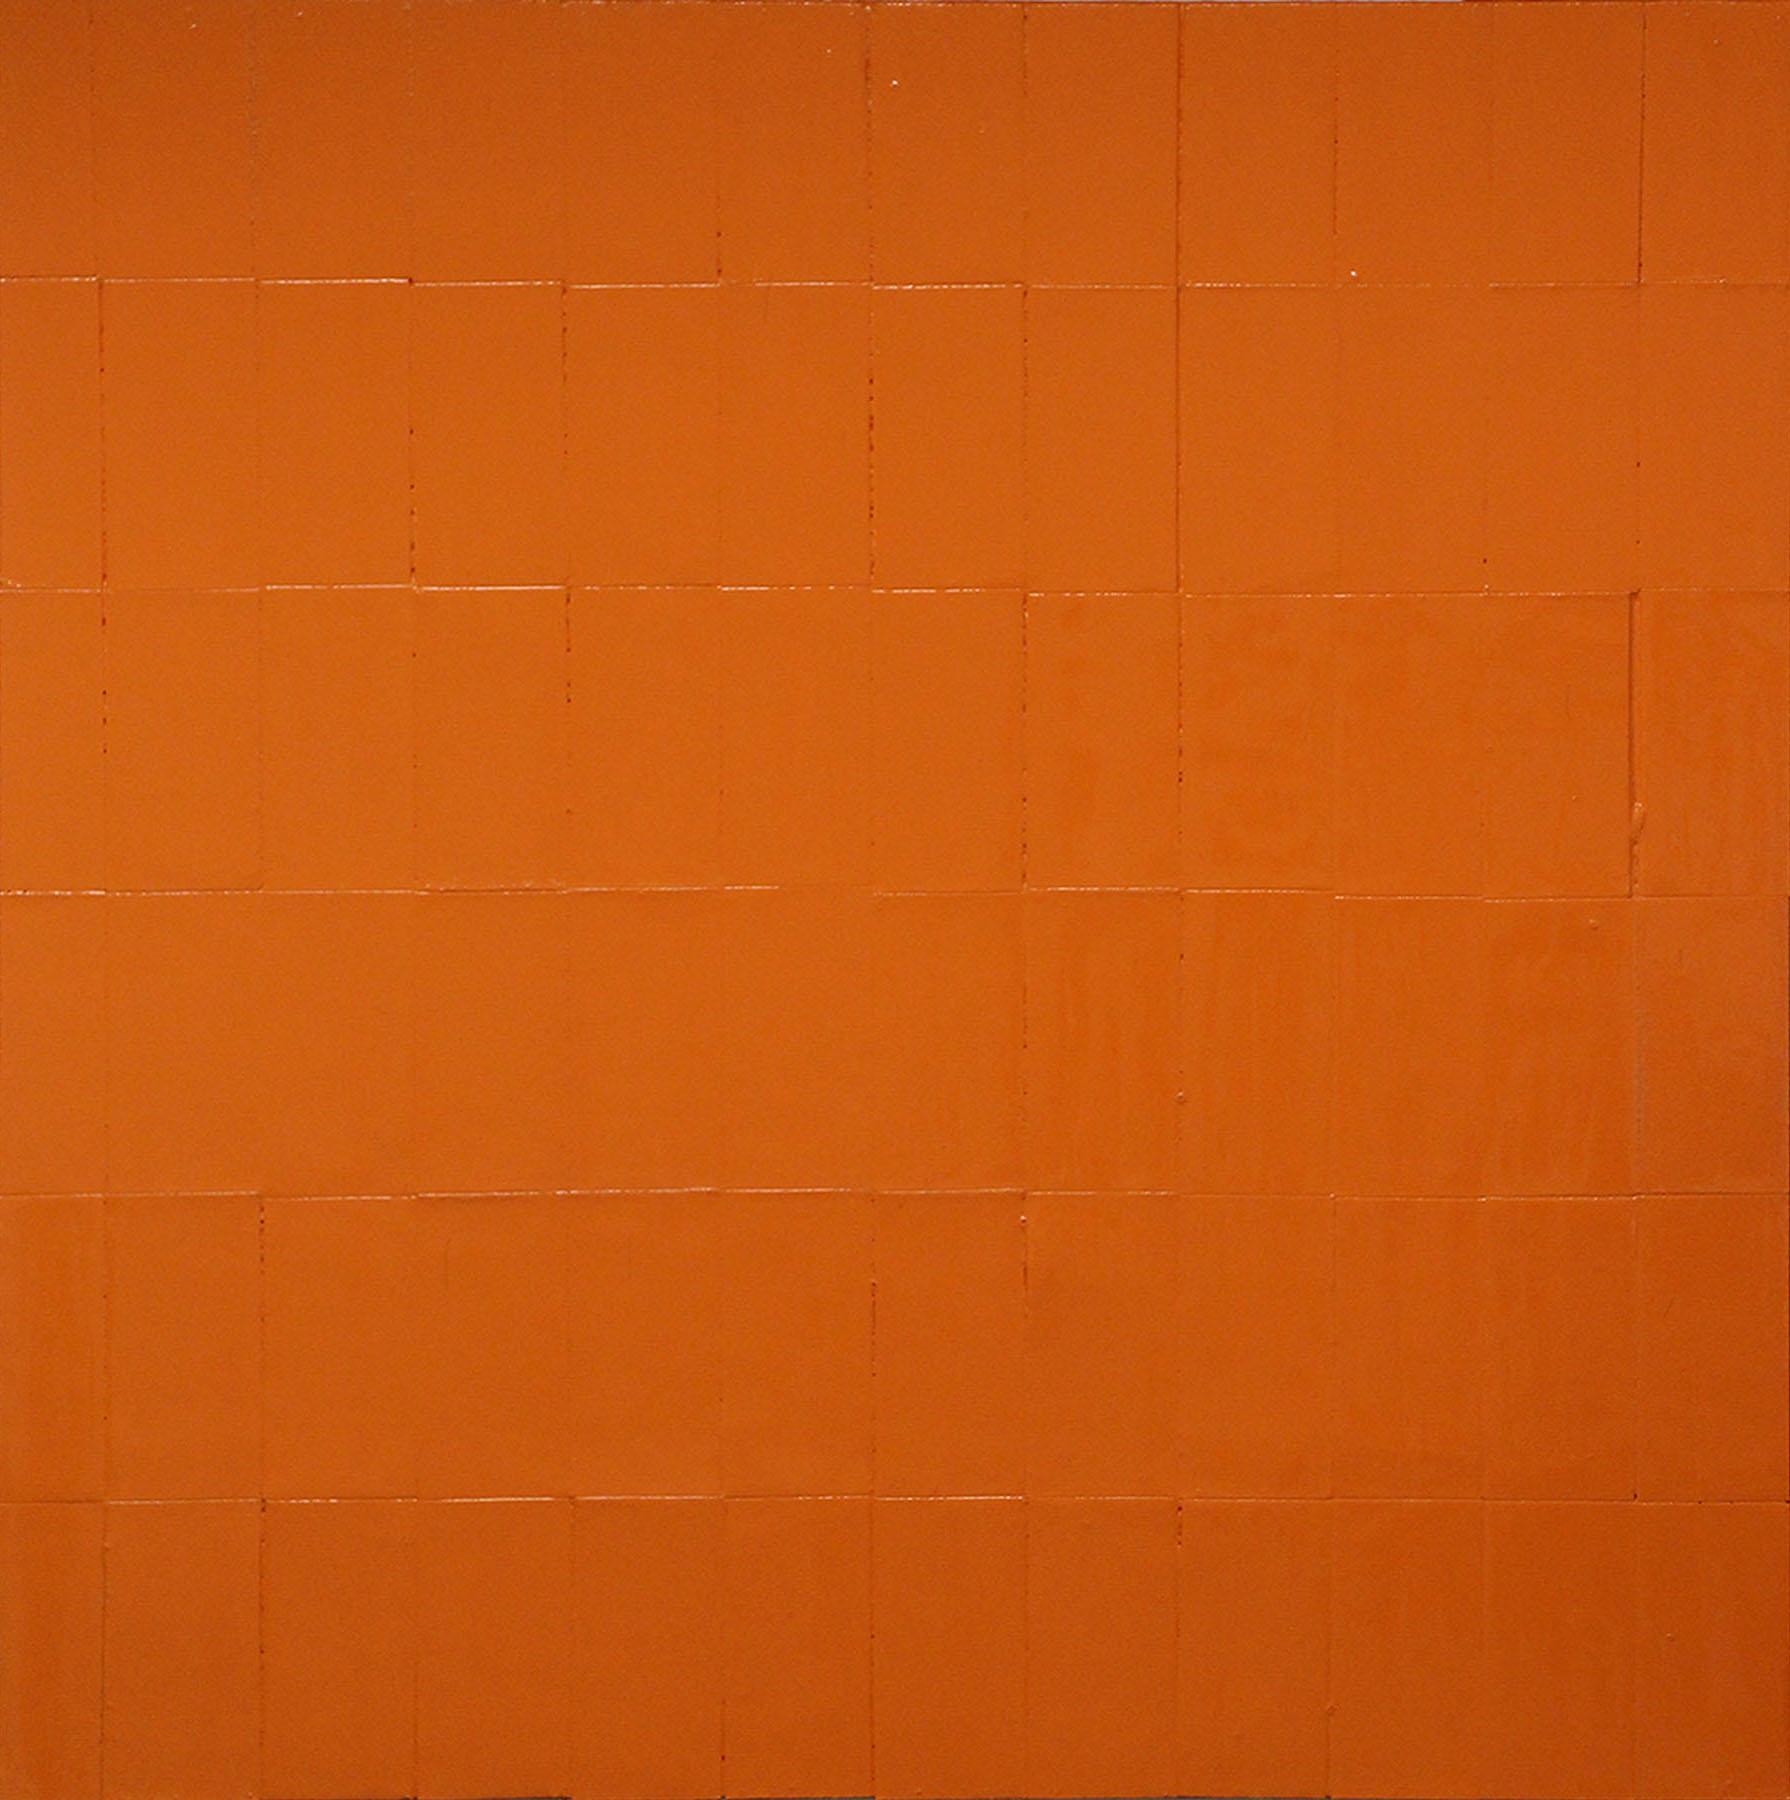 Orange Painting 1 10.12.14